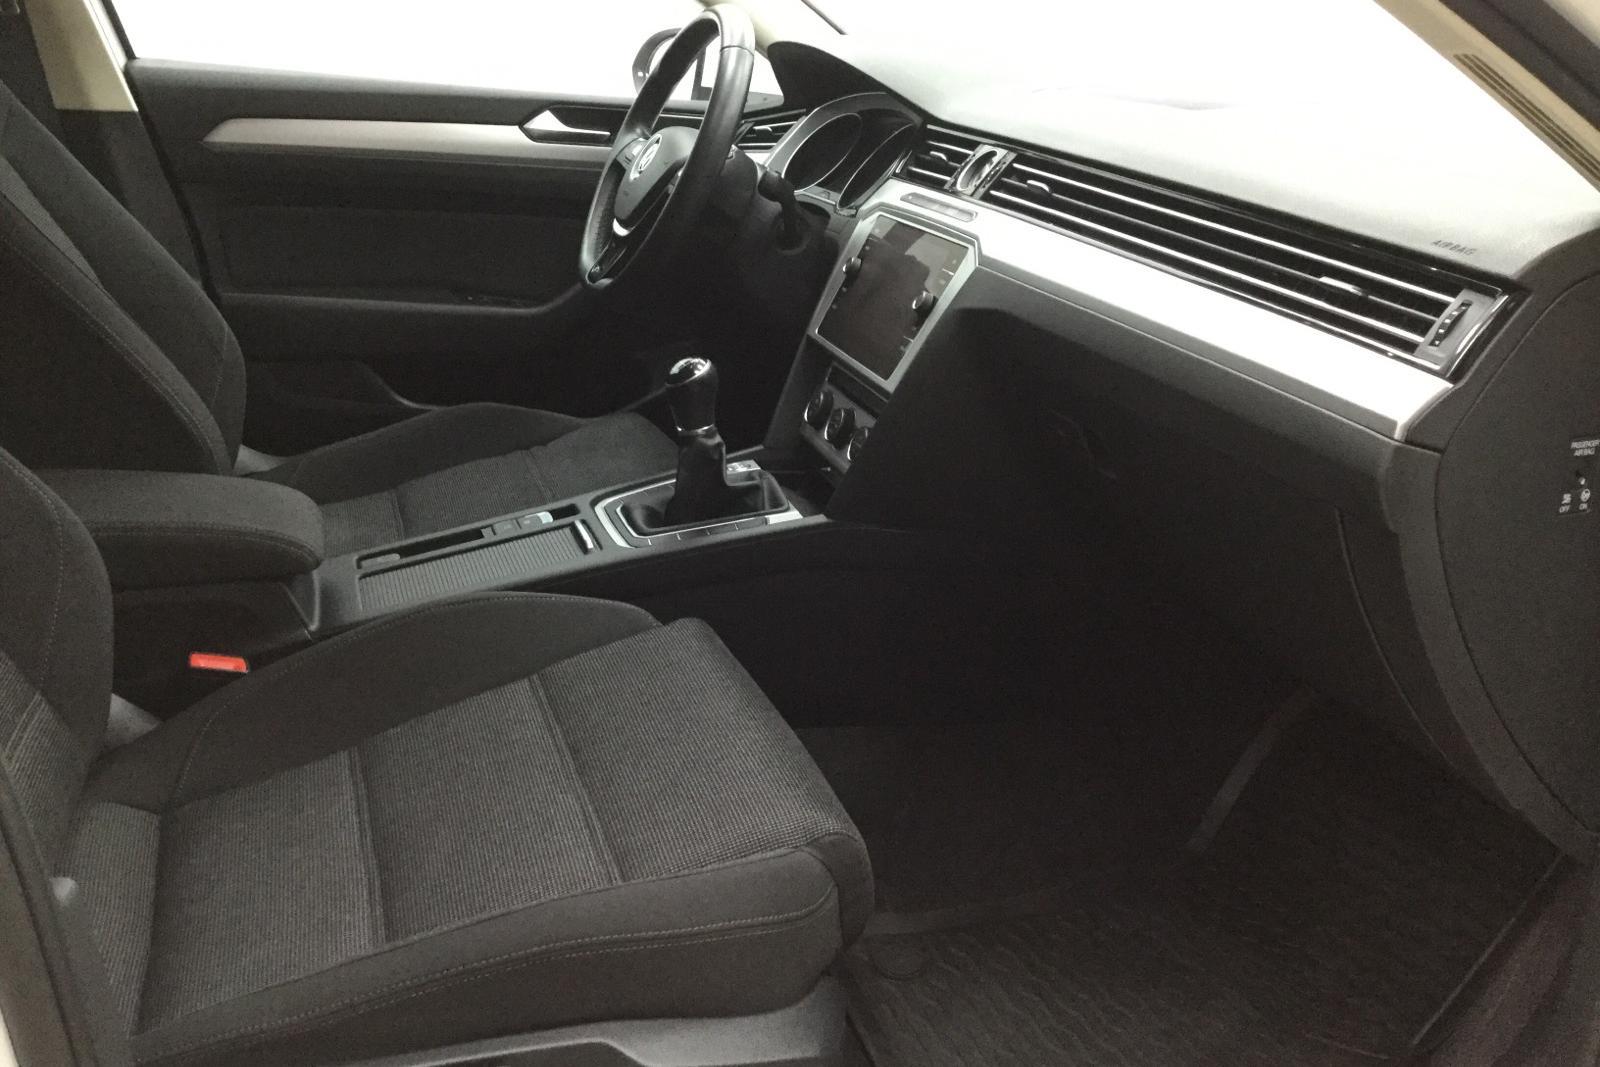 VW Passat 2.0 TDI Sportscombi (150hk) - 13 400 mil - Manuell - vit - 2018